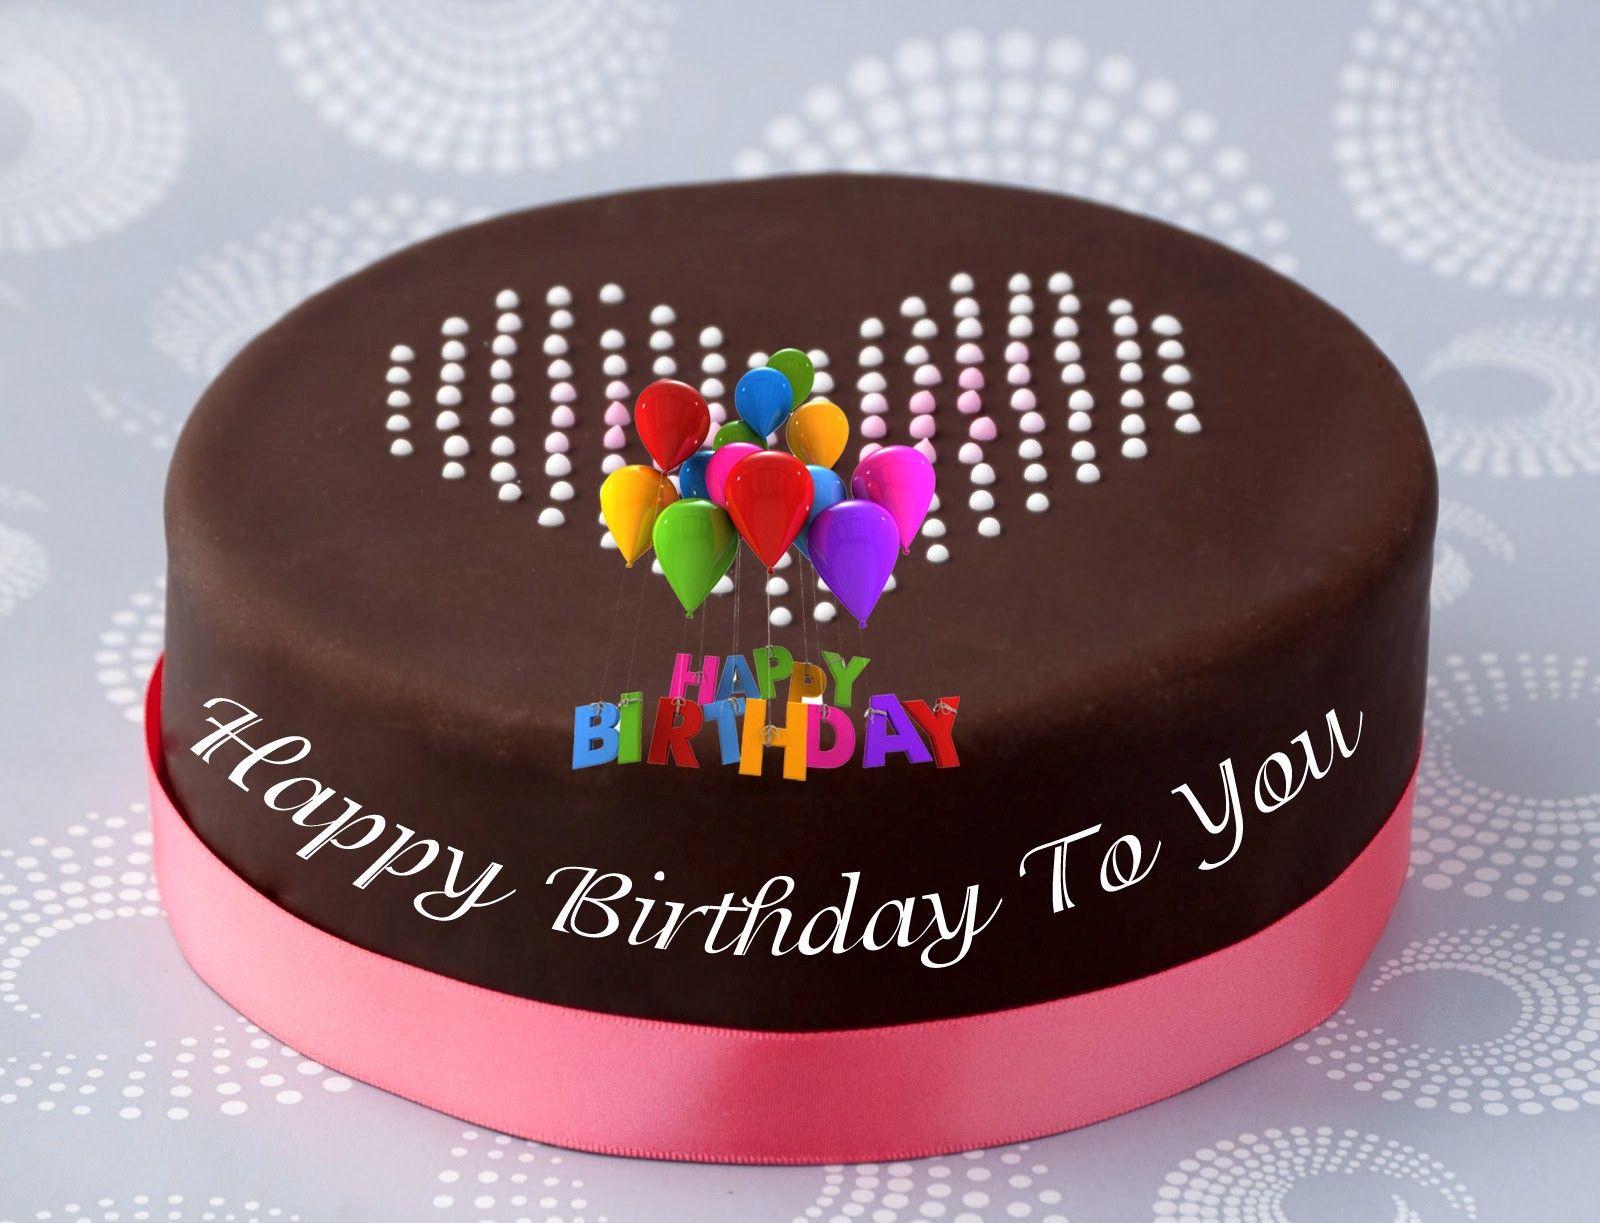 Swell Happy Birthday To You Cake Hd Pics Happy Birthday Cake Pictures Personalised Birthday Cards Beptaeletsinfo